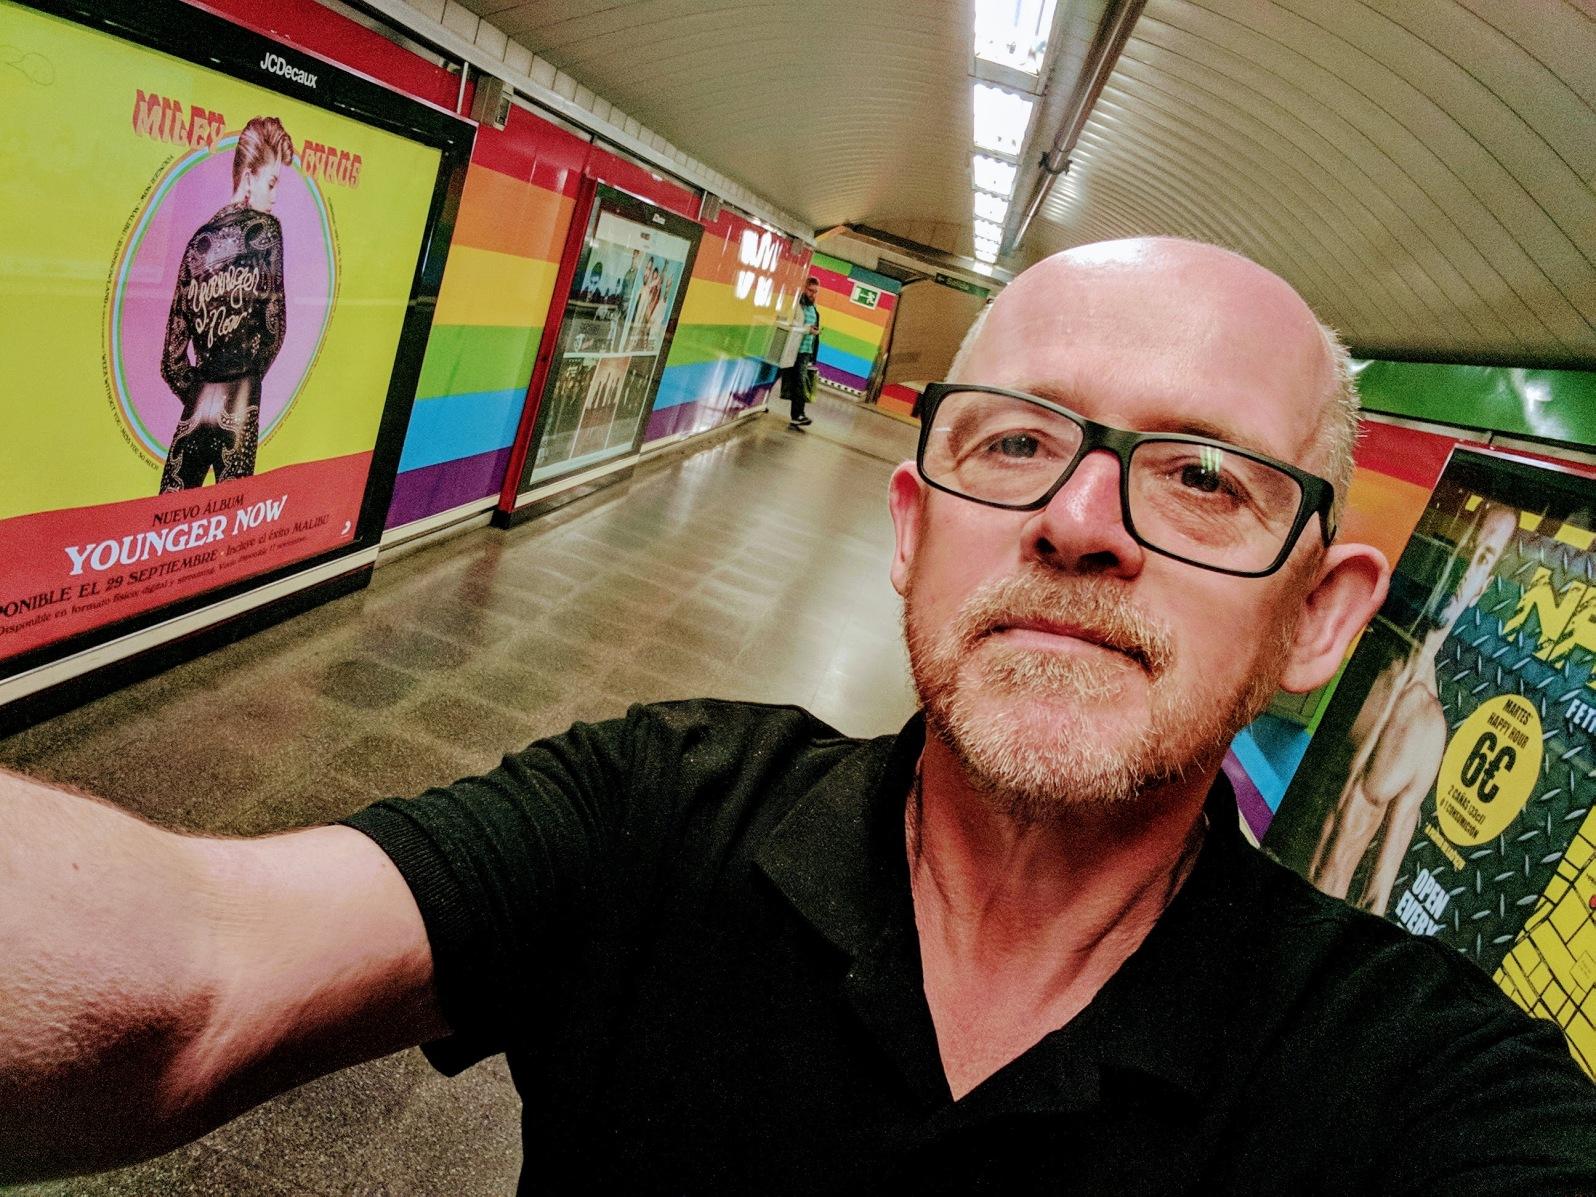 Rainbow Metro in Madrid